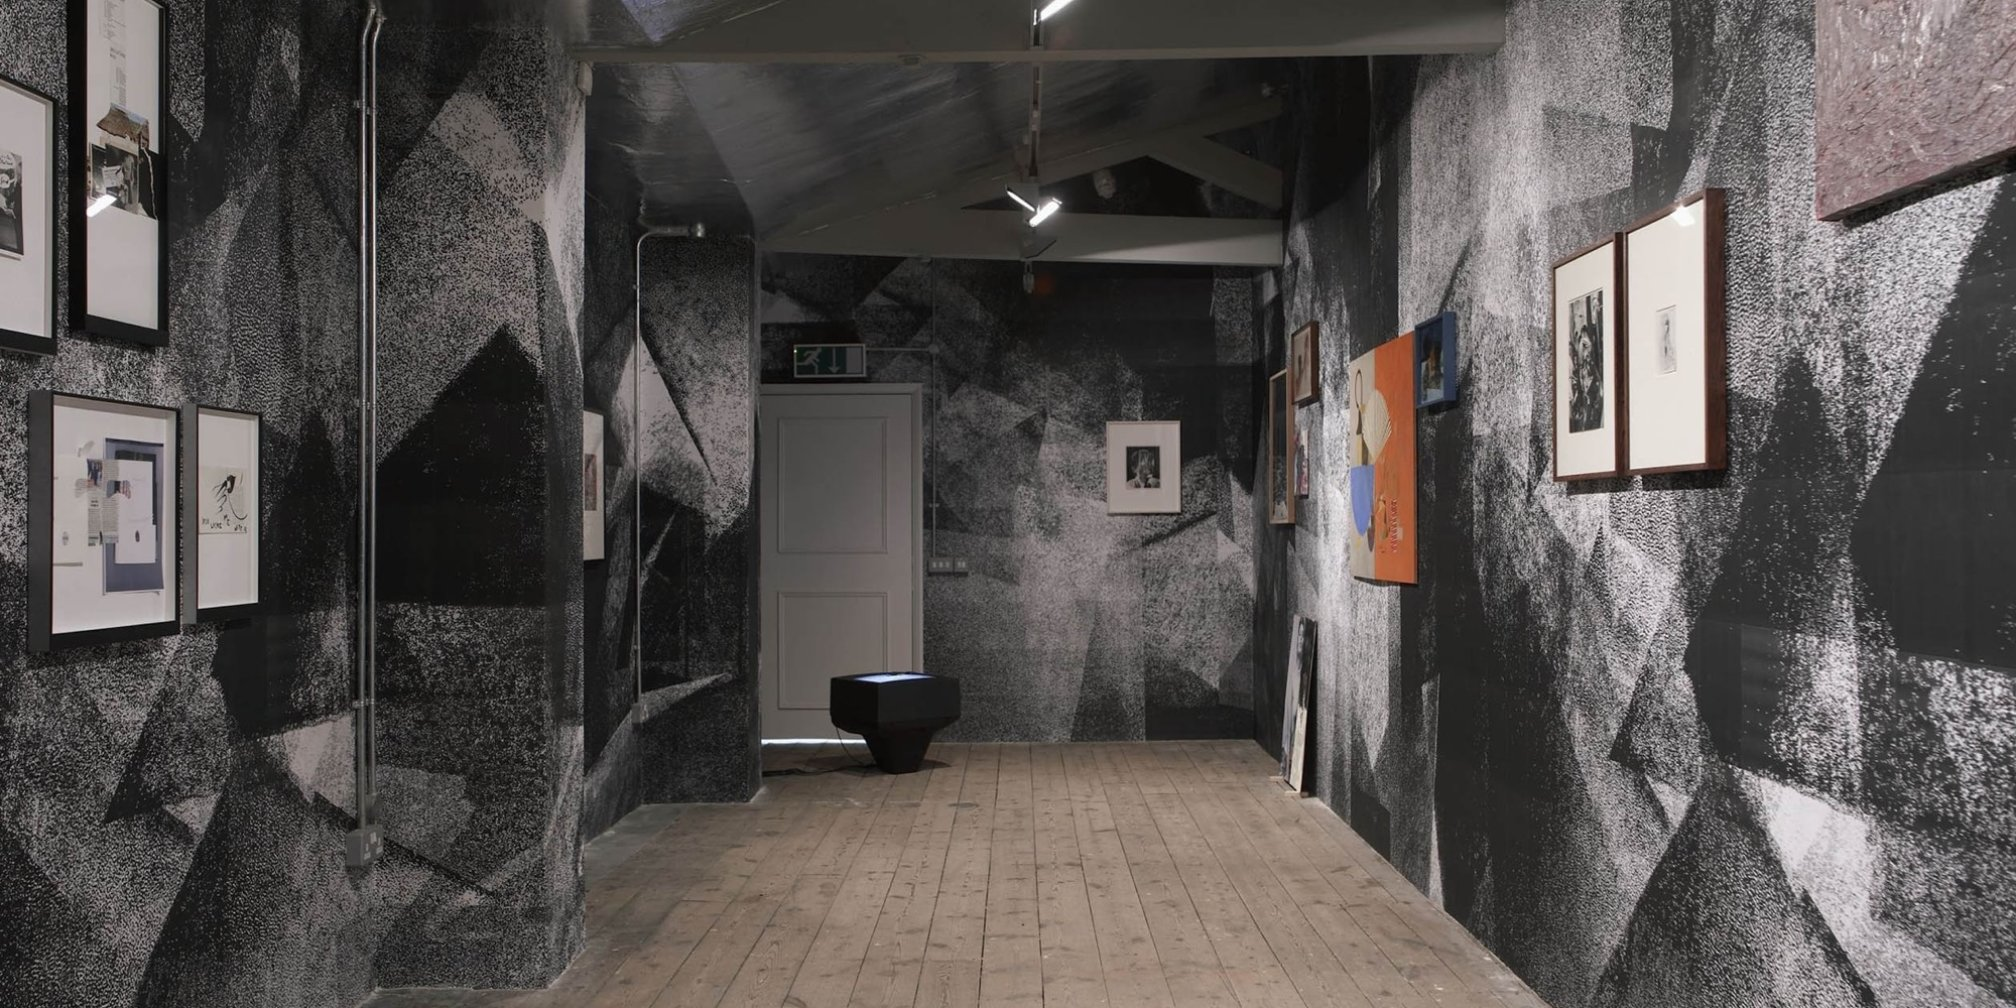 Installation view, Past Forward, 2008 at Zabludowicz Collection, London. Photo: Stephen White